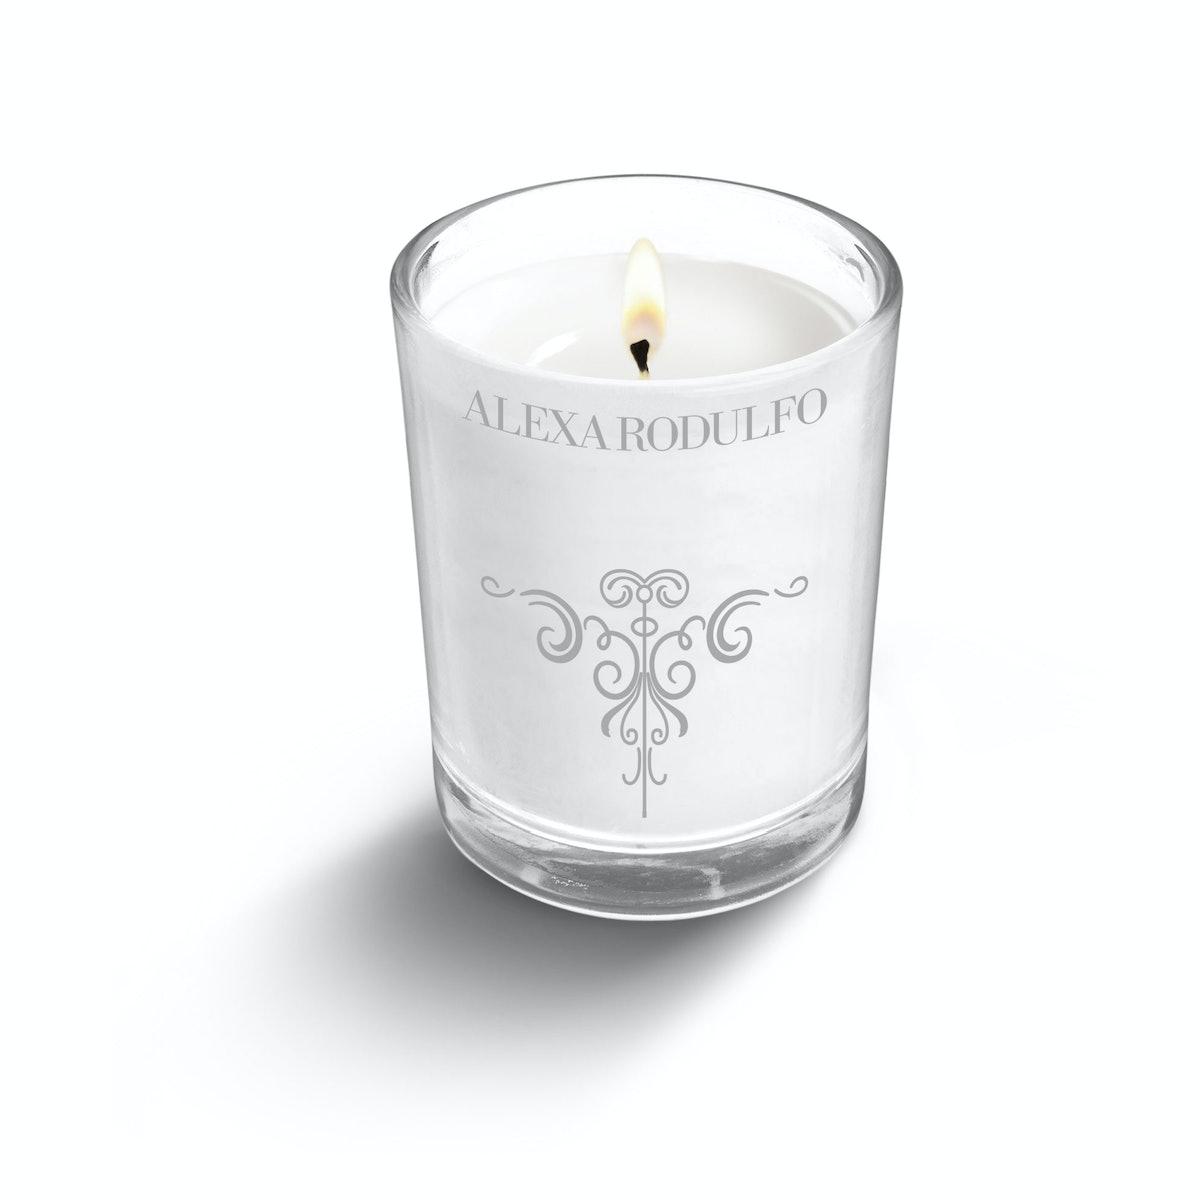 Alexa Roldulfo The Candle: Woods, $35, [alexarodulfo.com](http://alexarodulfo.com).